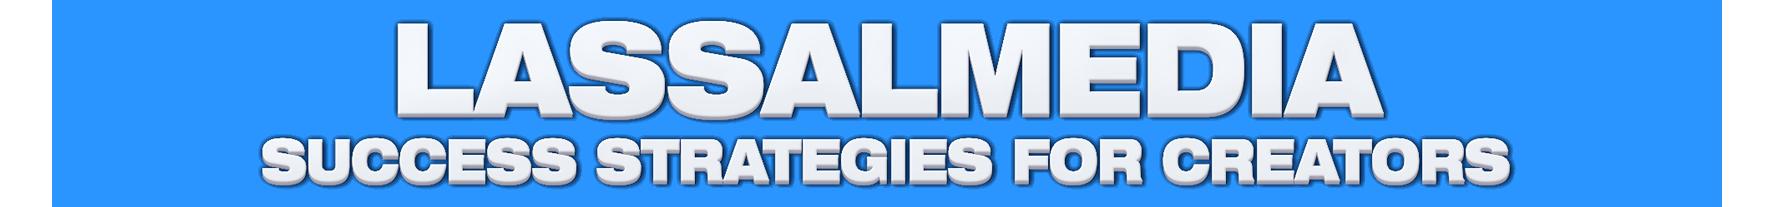 LassalMedia - success strategies for creators